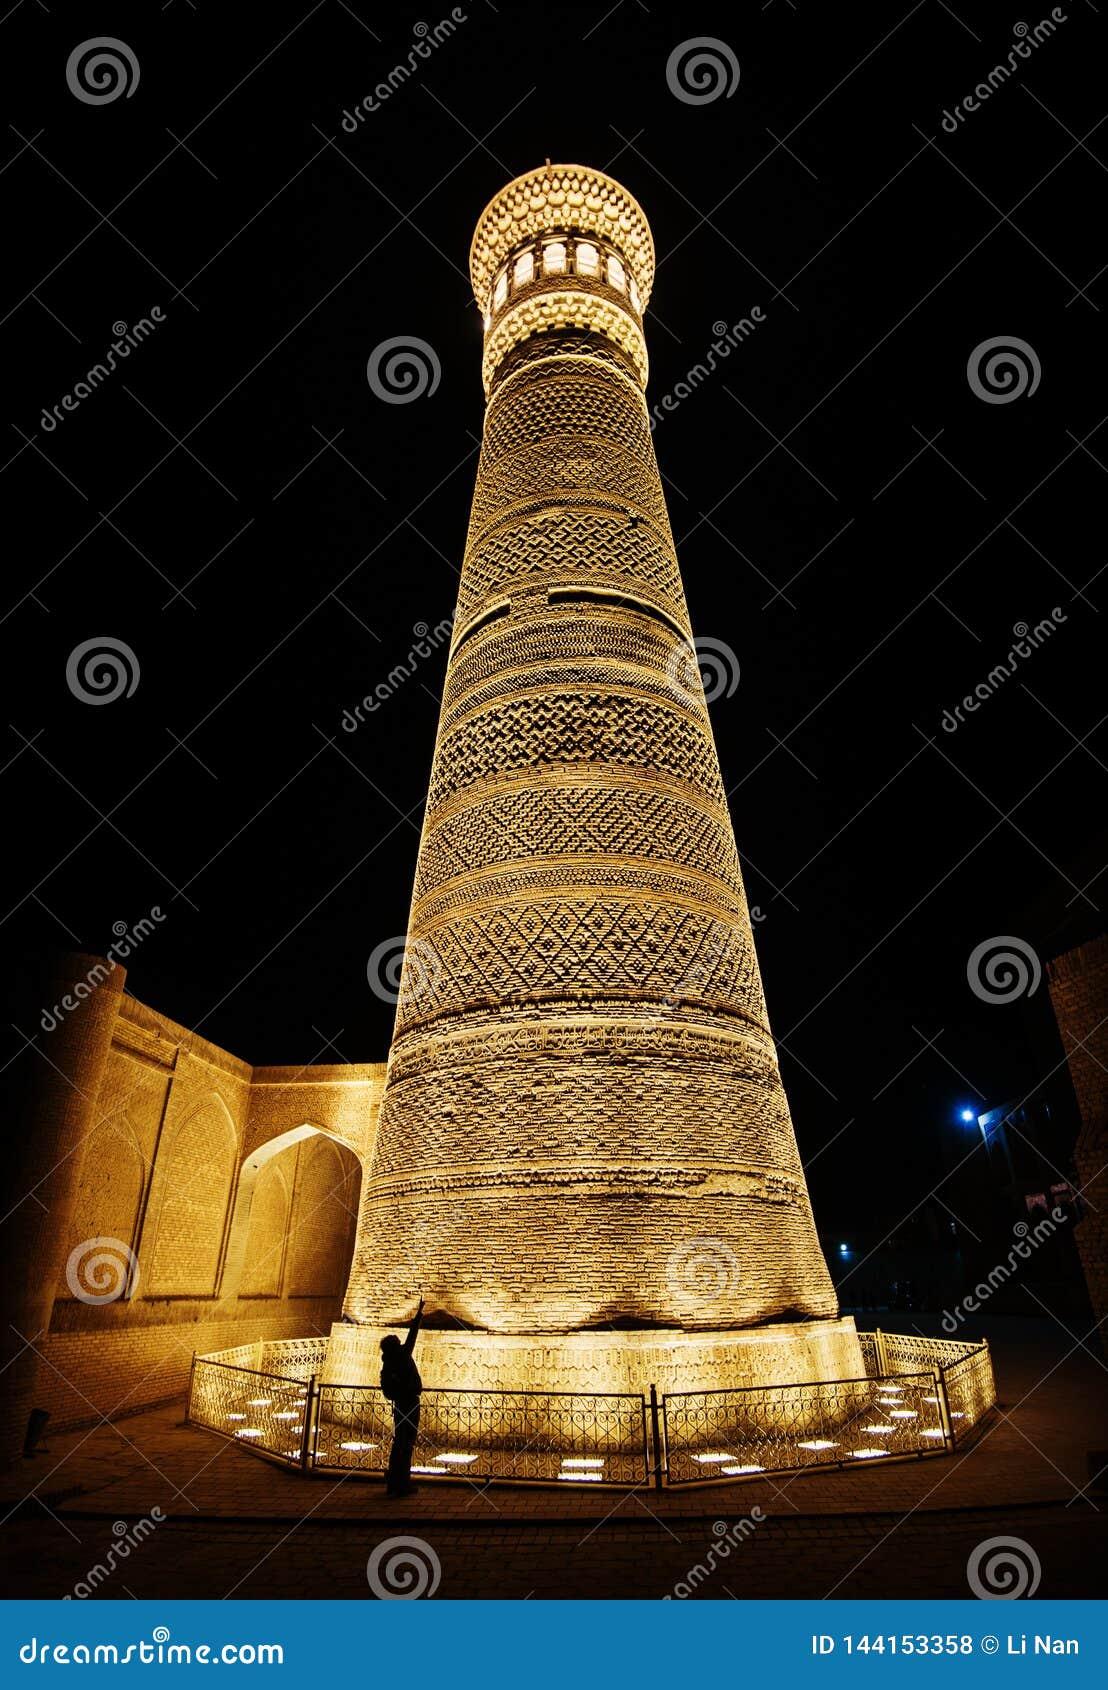 Kalon历史的古老废墟夜景的伟大的尖塔,Mir我阿拉伯人Madrasah广场,布哈拉,乌兹别克斯坦